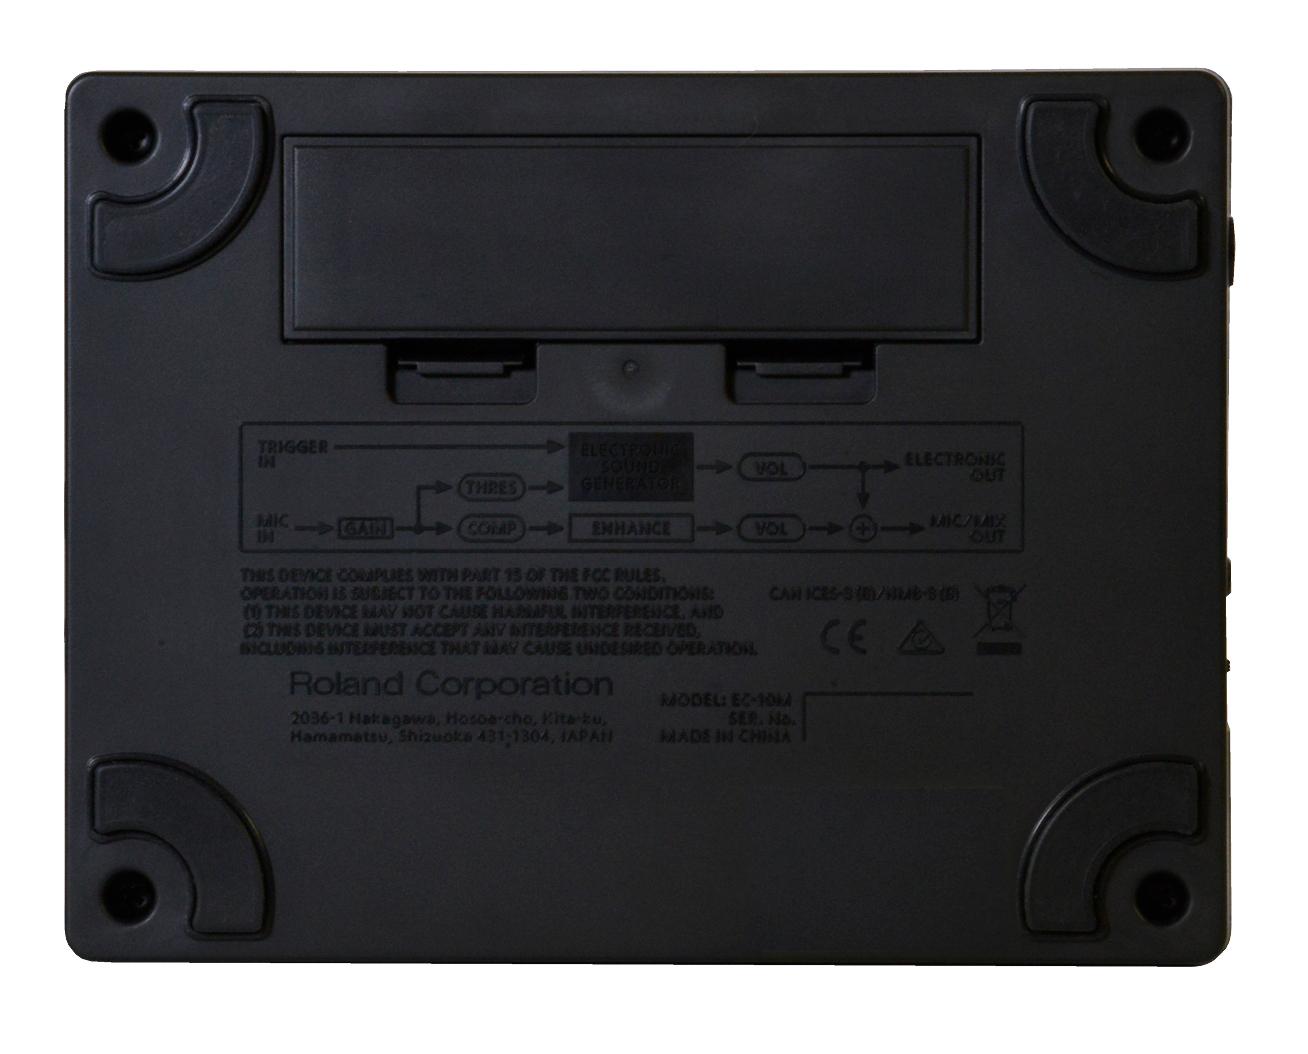 ElCajon Mic Processor